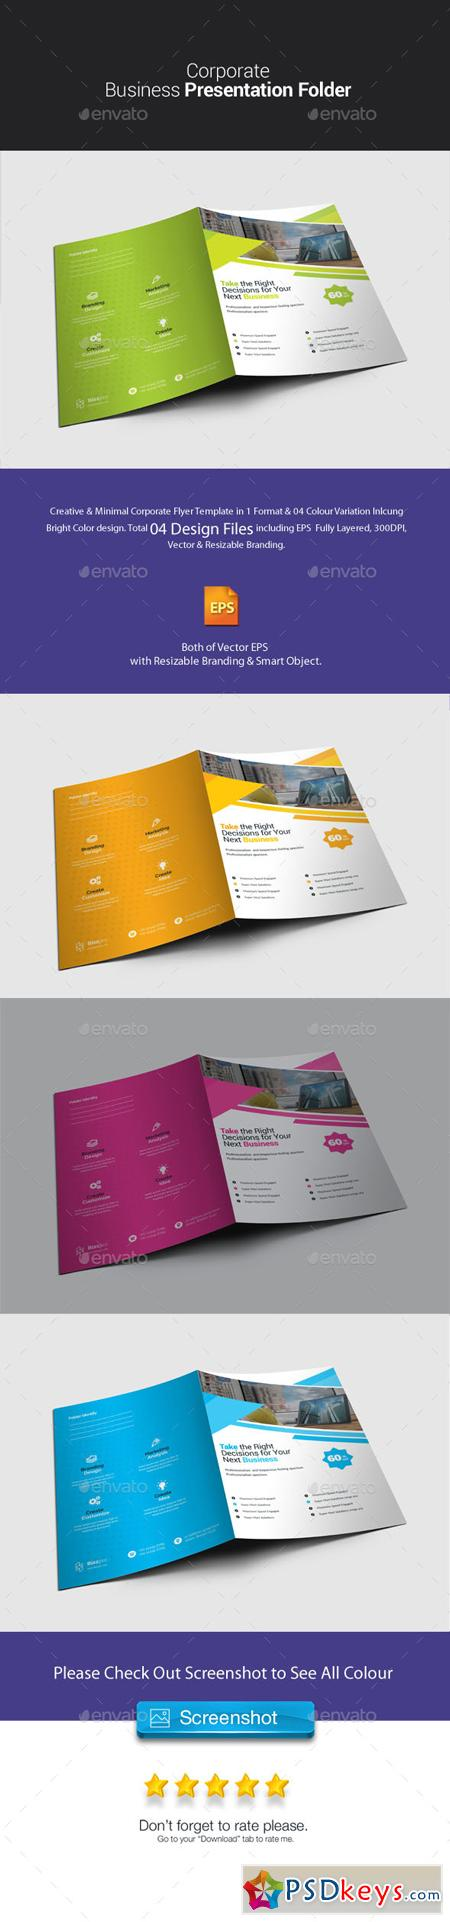 Corporate Presentation Folder 23077538